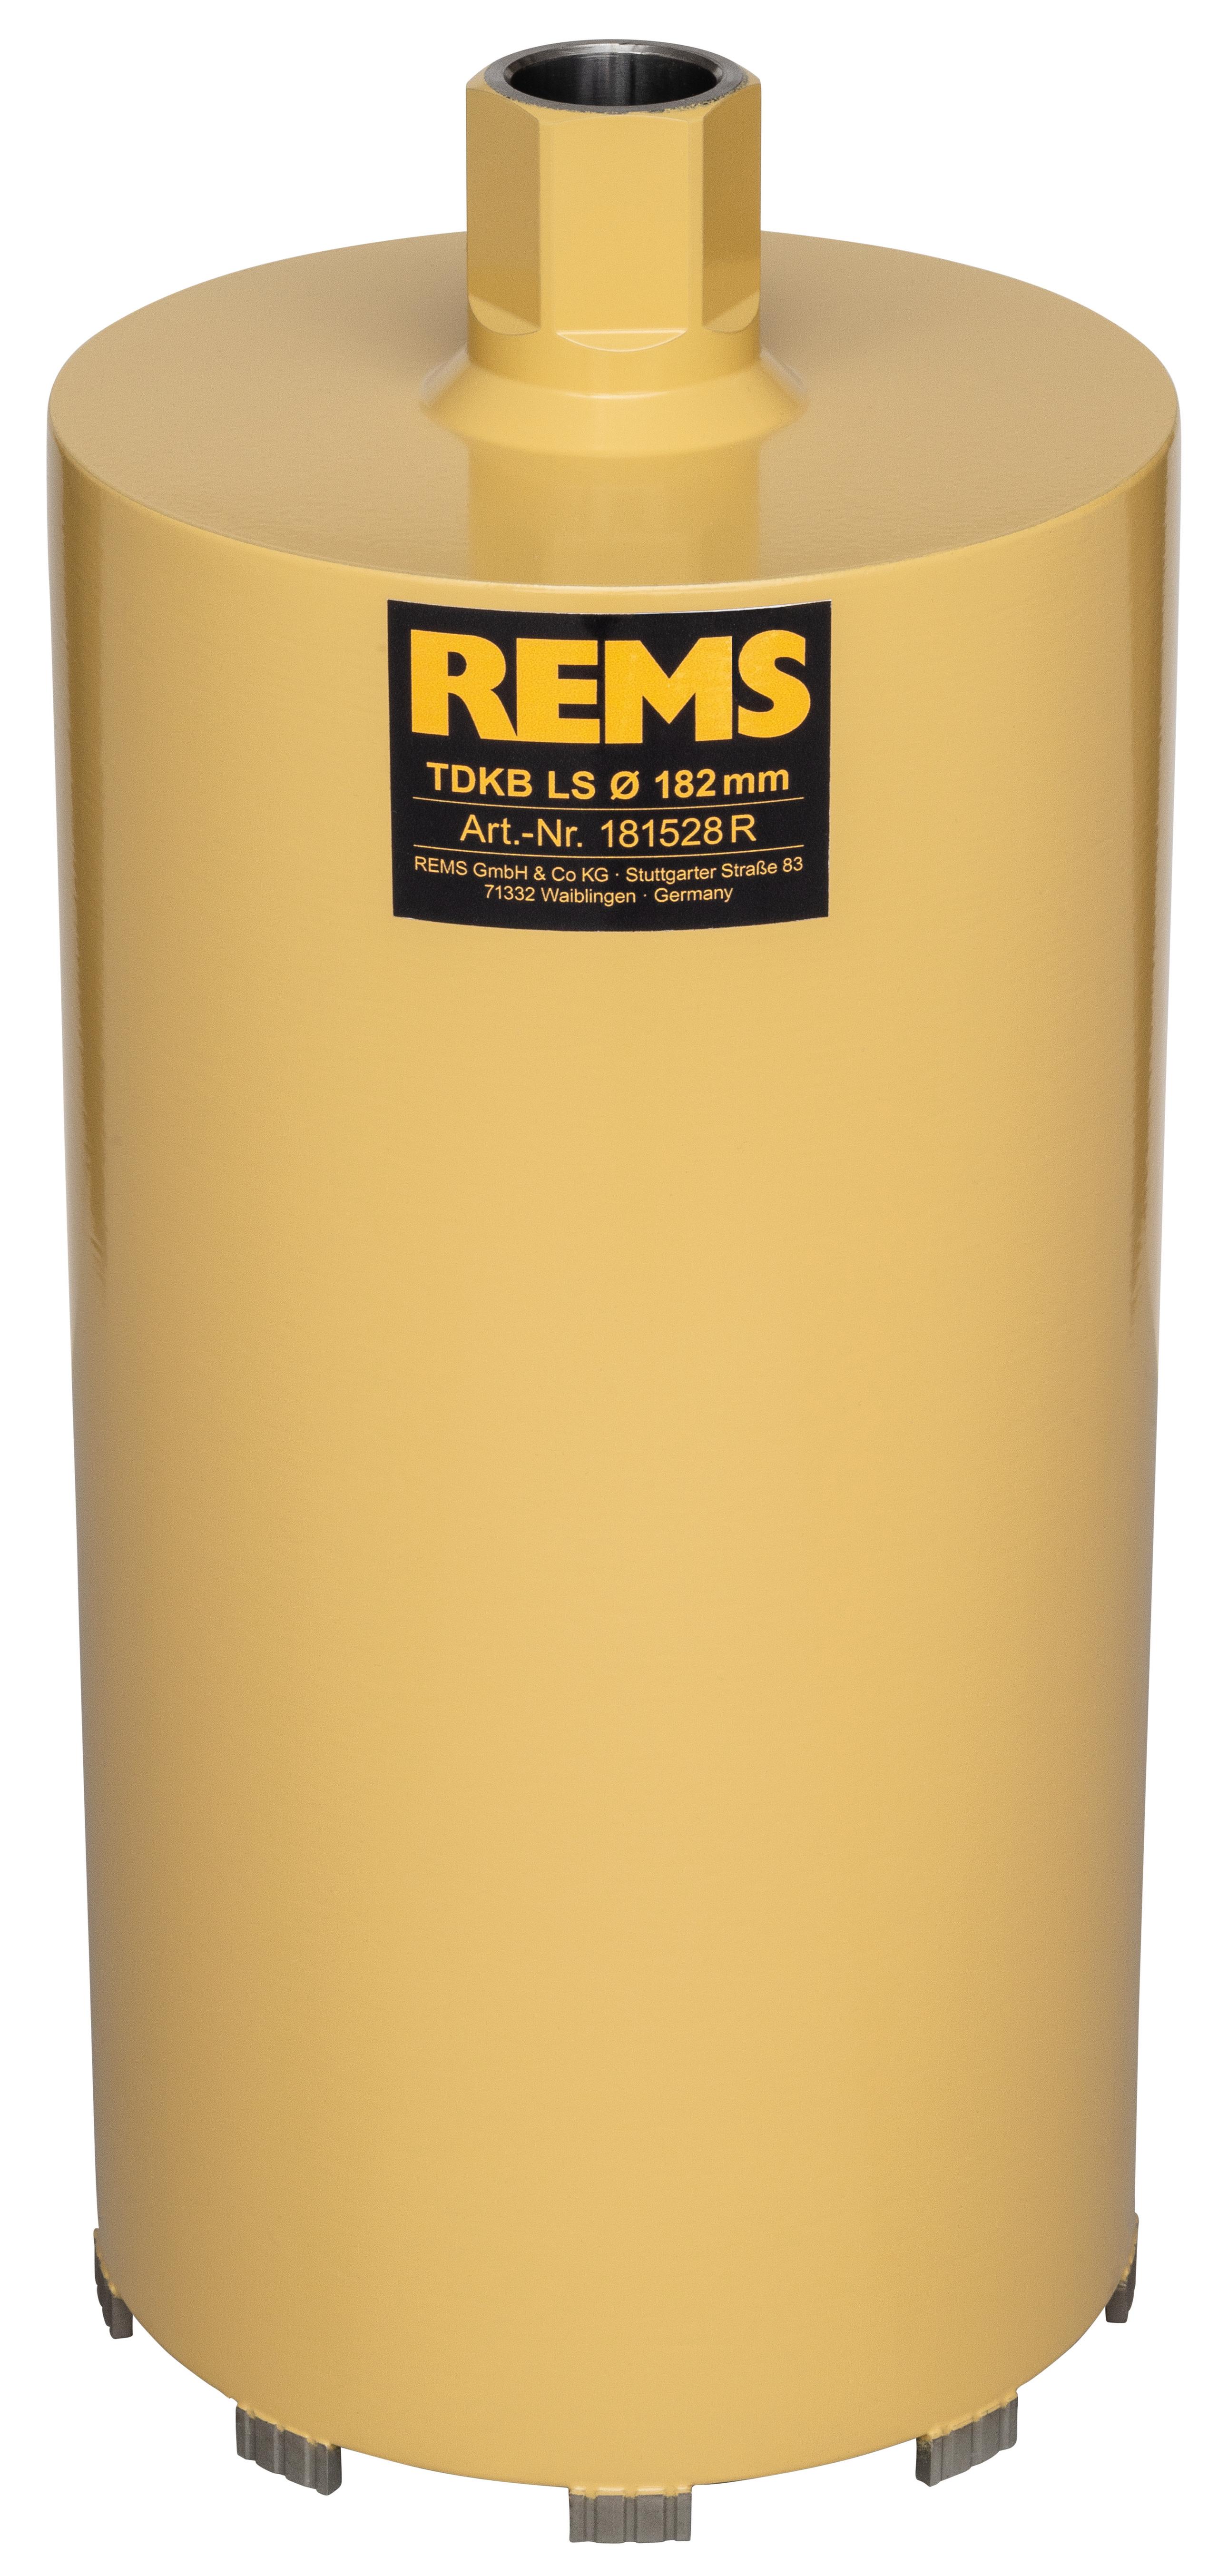 <br/>REMS TDKB LS 182x320xUNC 1 1/4